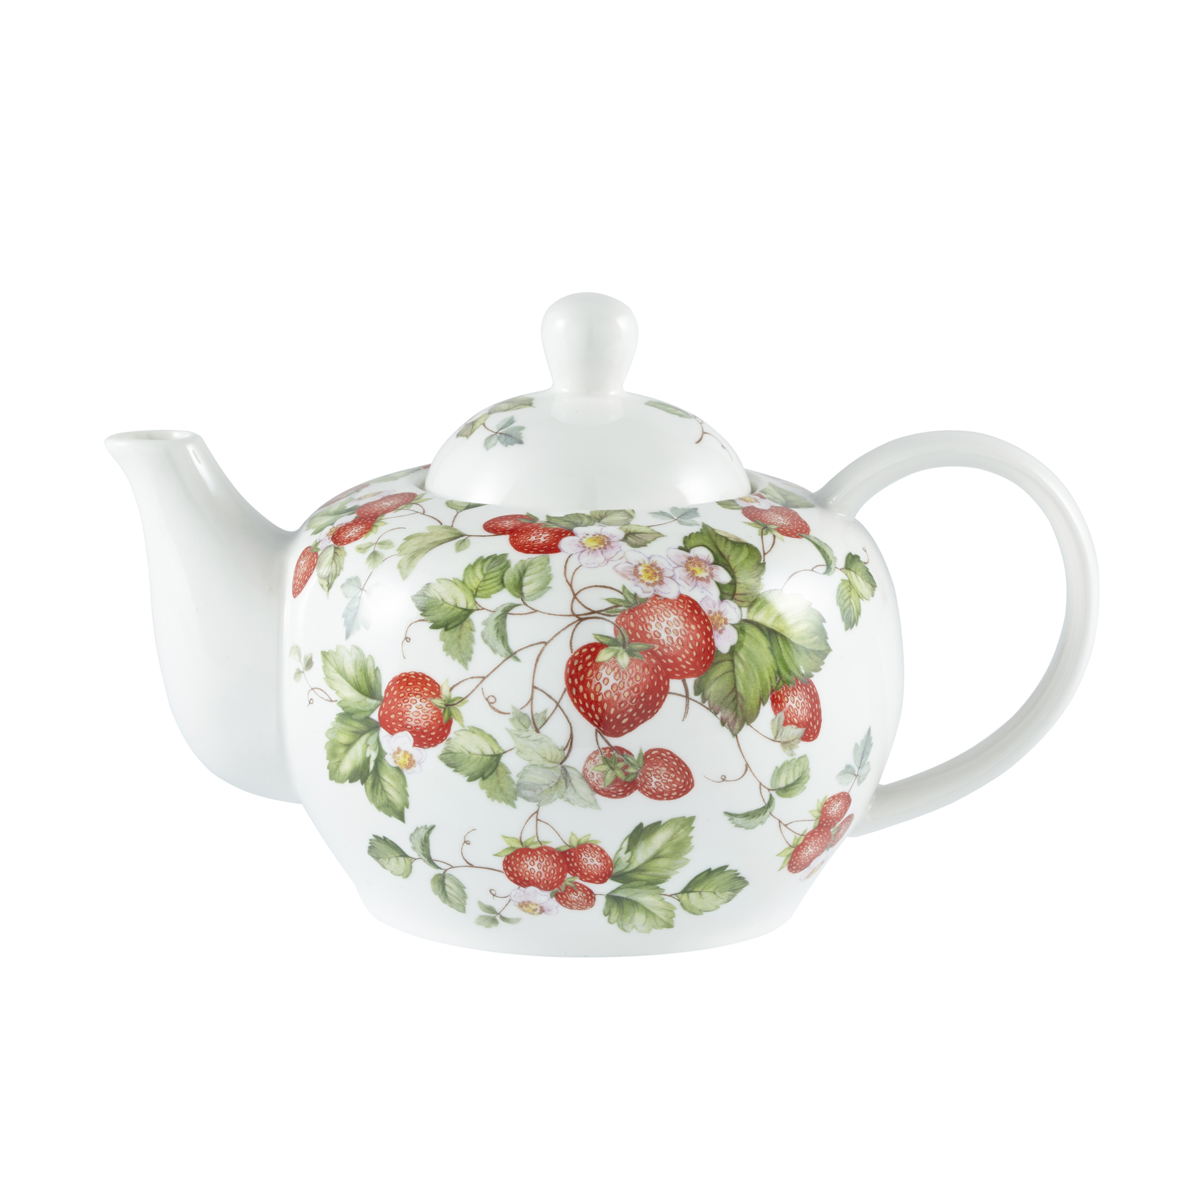 точило kitcheniq 50387 Заварочный чайник GIPFEL FRAGOLE 50387